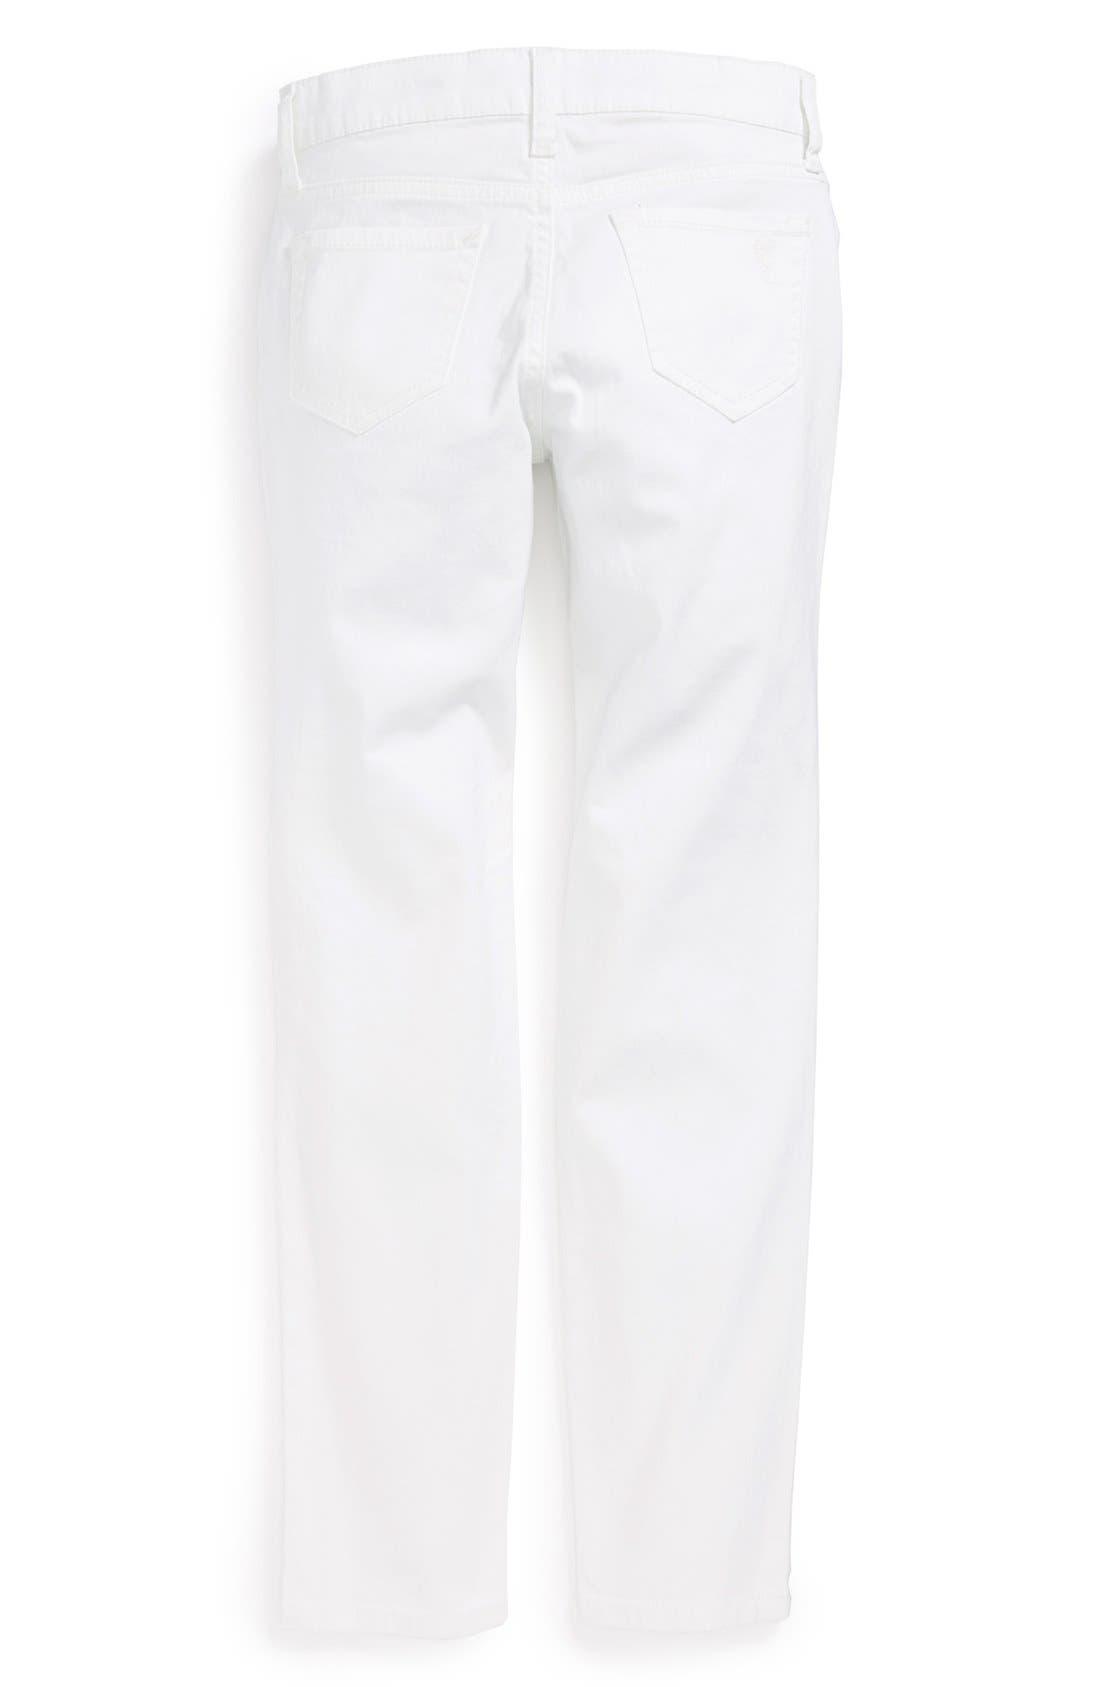 Alternate Image 1 Selected - Jessica Simpson 'Kiss Me' Skinny Jeans (Big Girls)